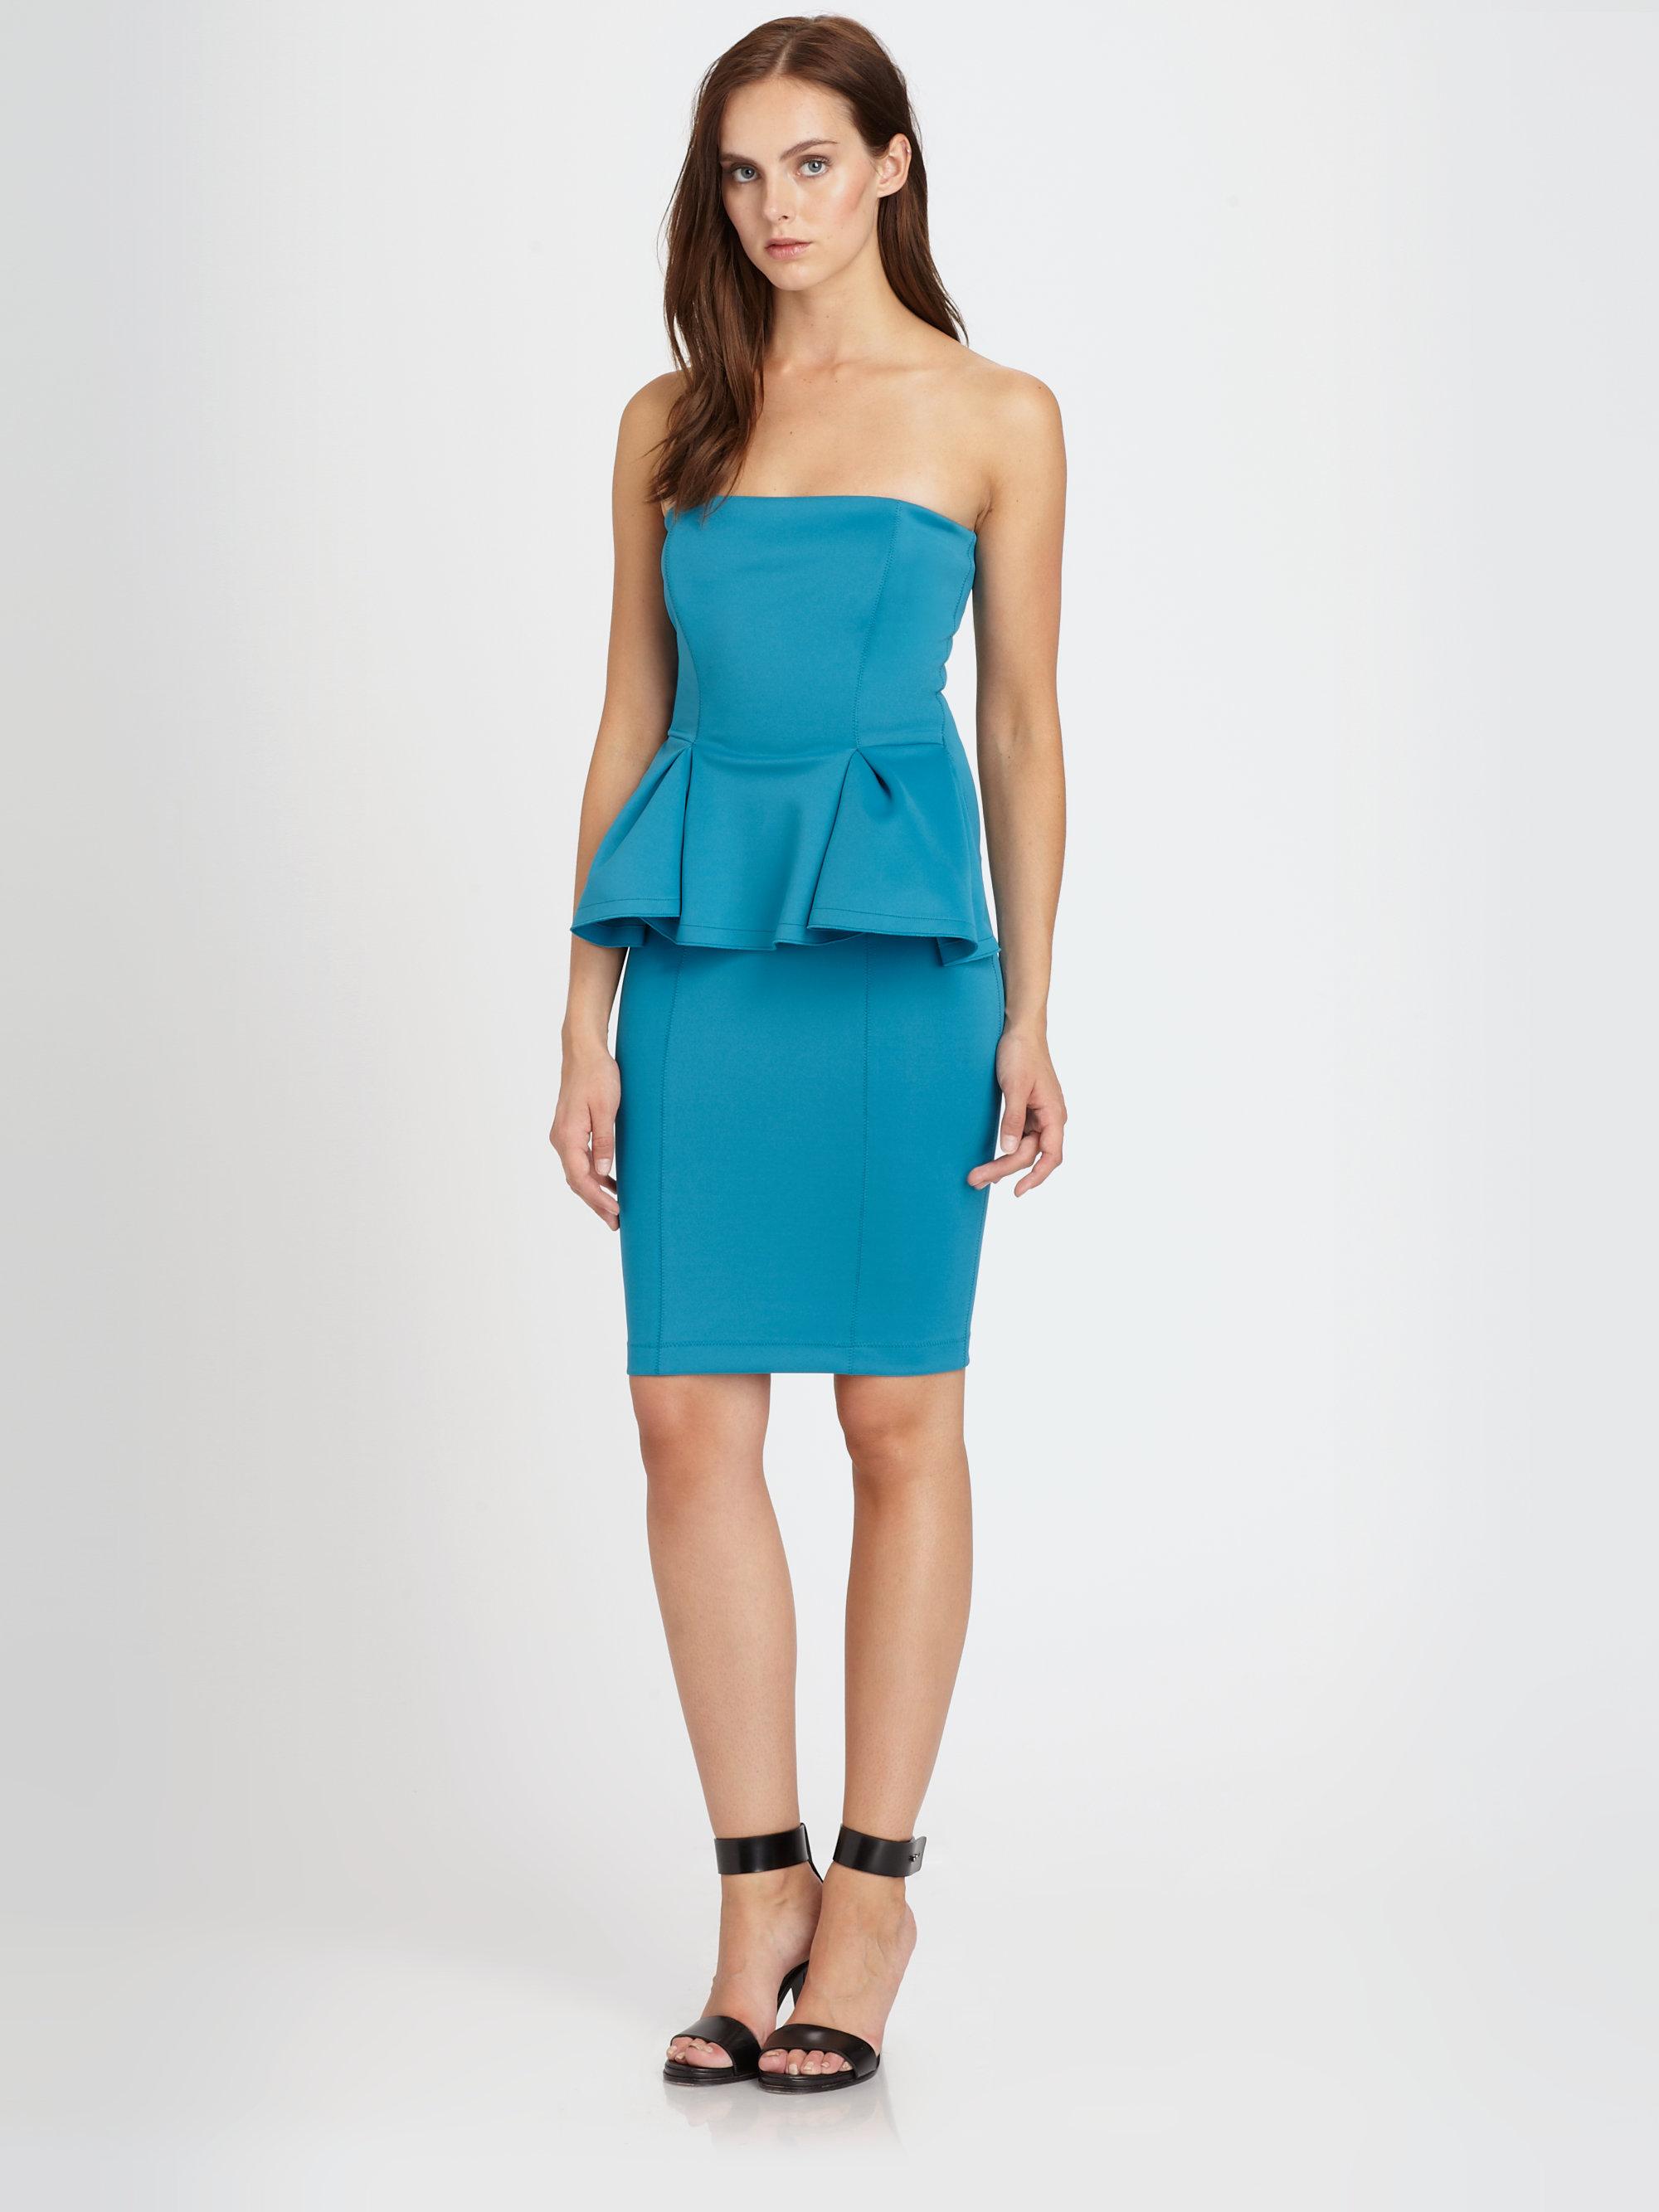 Torn Camilla Strapless Scuba Jersey Peplum Dress in Blue | Lyst